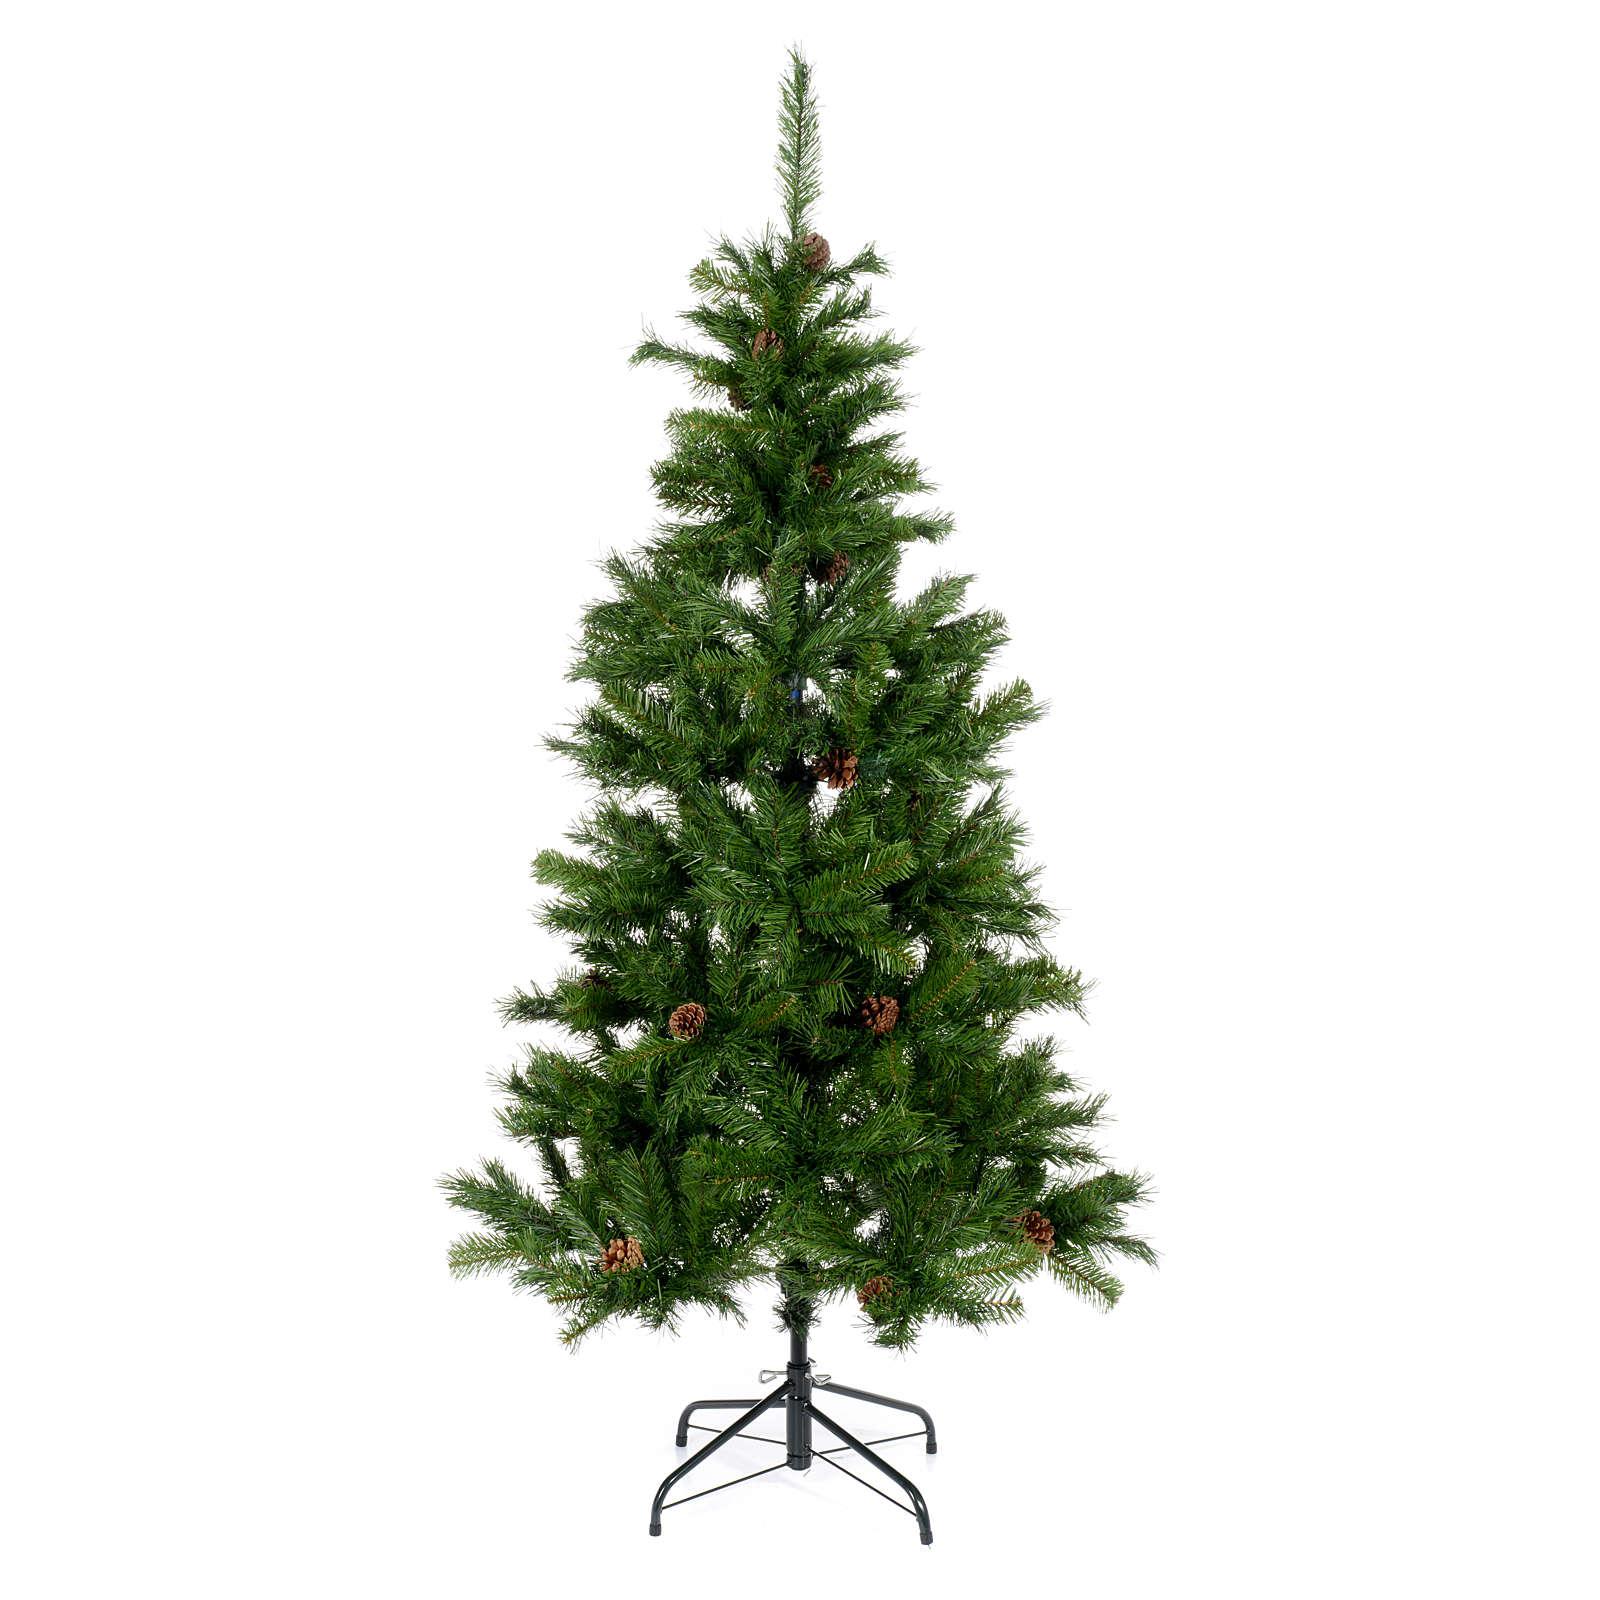 Sapin de Noël 230 cm vert modèle Slim Tallin 3